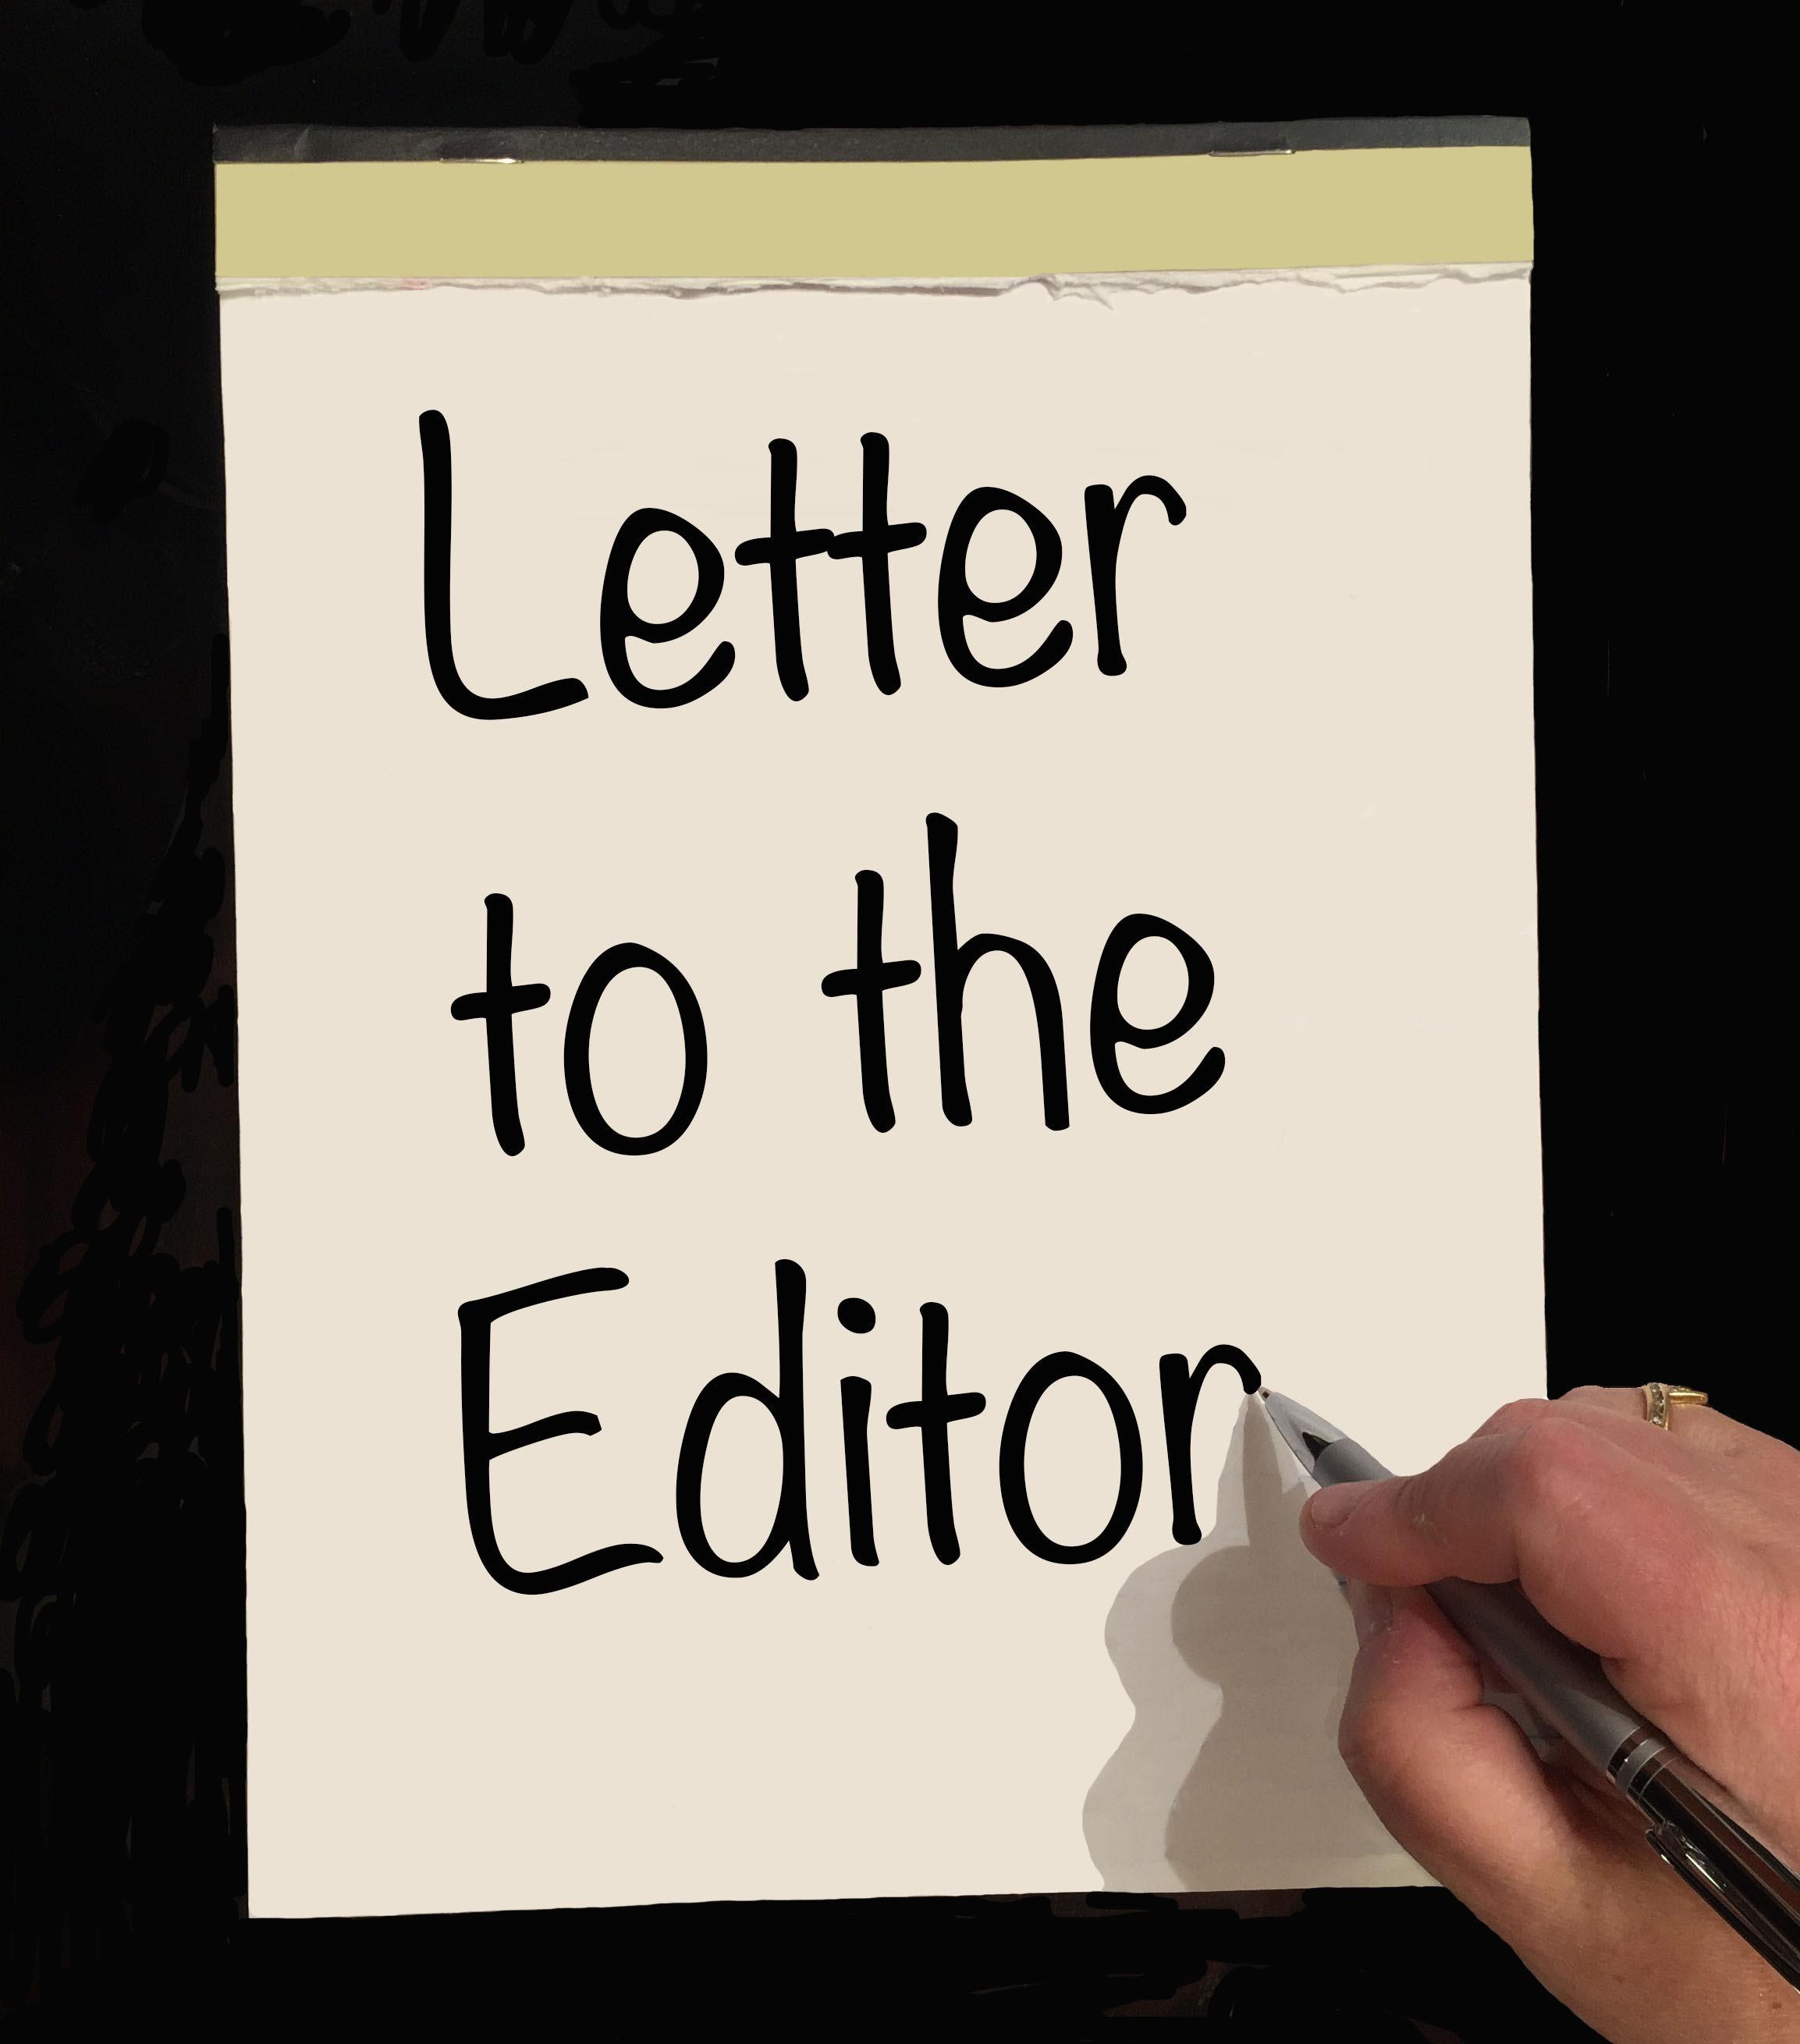 da77f0831616531a3082_7f9e62e6f50af0cd18b2_Letter_to_the_Editor_2.jpg